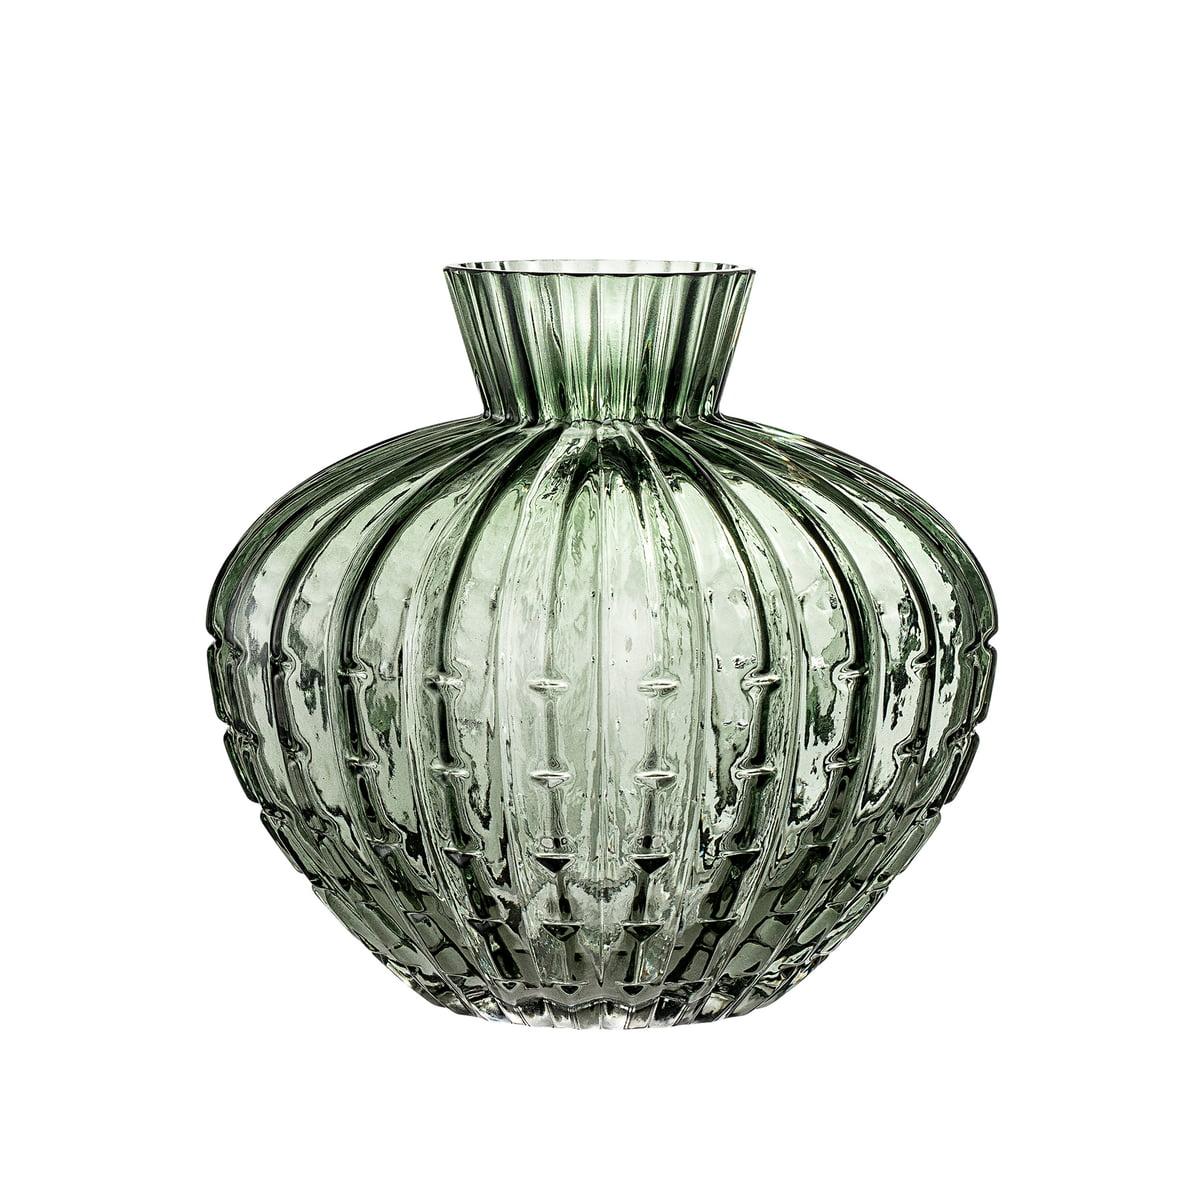 Glas Vase von Bloomingville   Connox